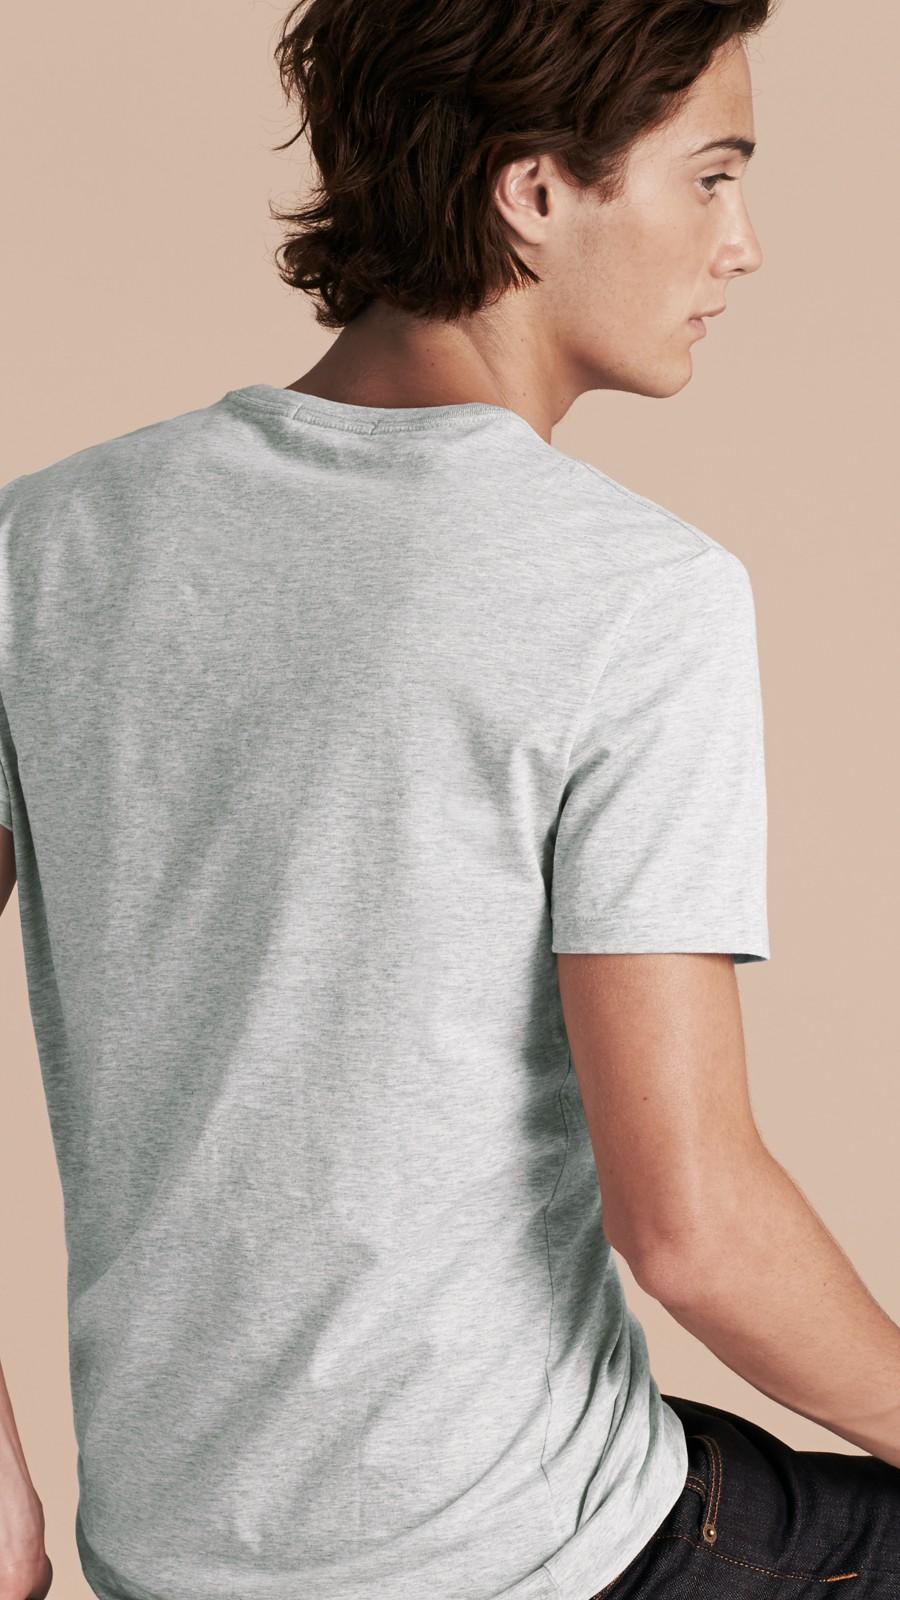 Pale grey melange Liquid-soft Cotton T-Shirt Pale Grey Melange - Image 3